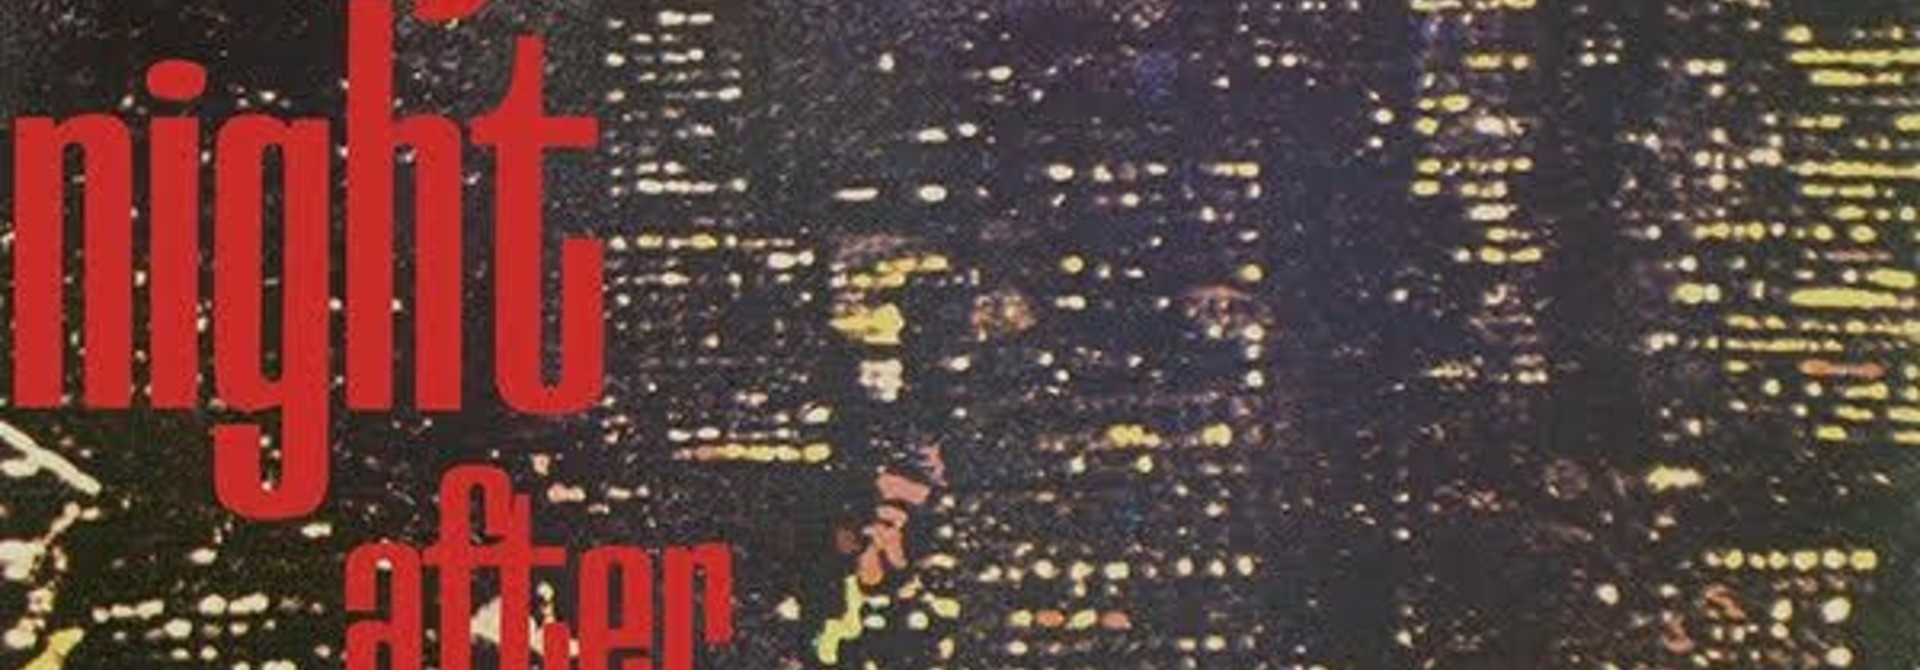 Ike Yard • Night After Night (RSD2020)